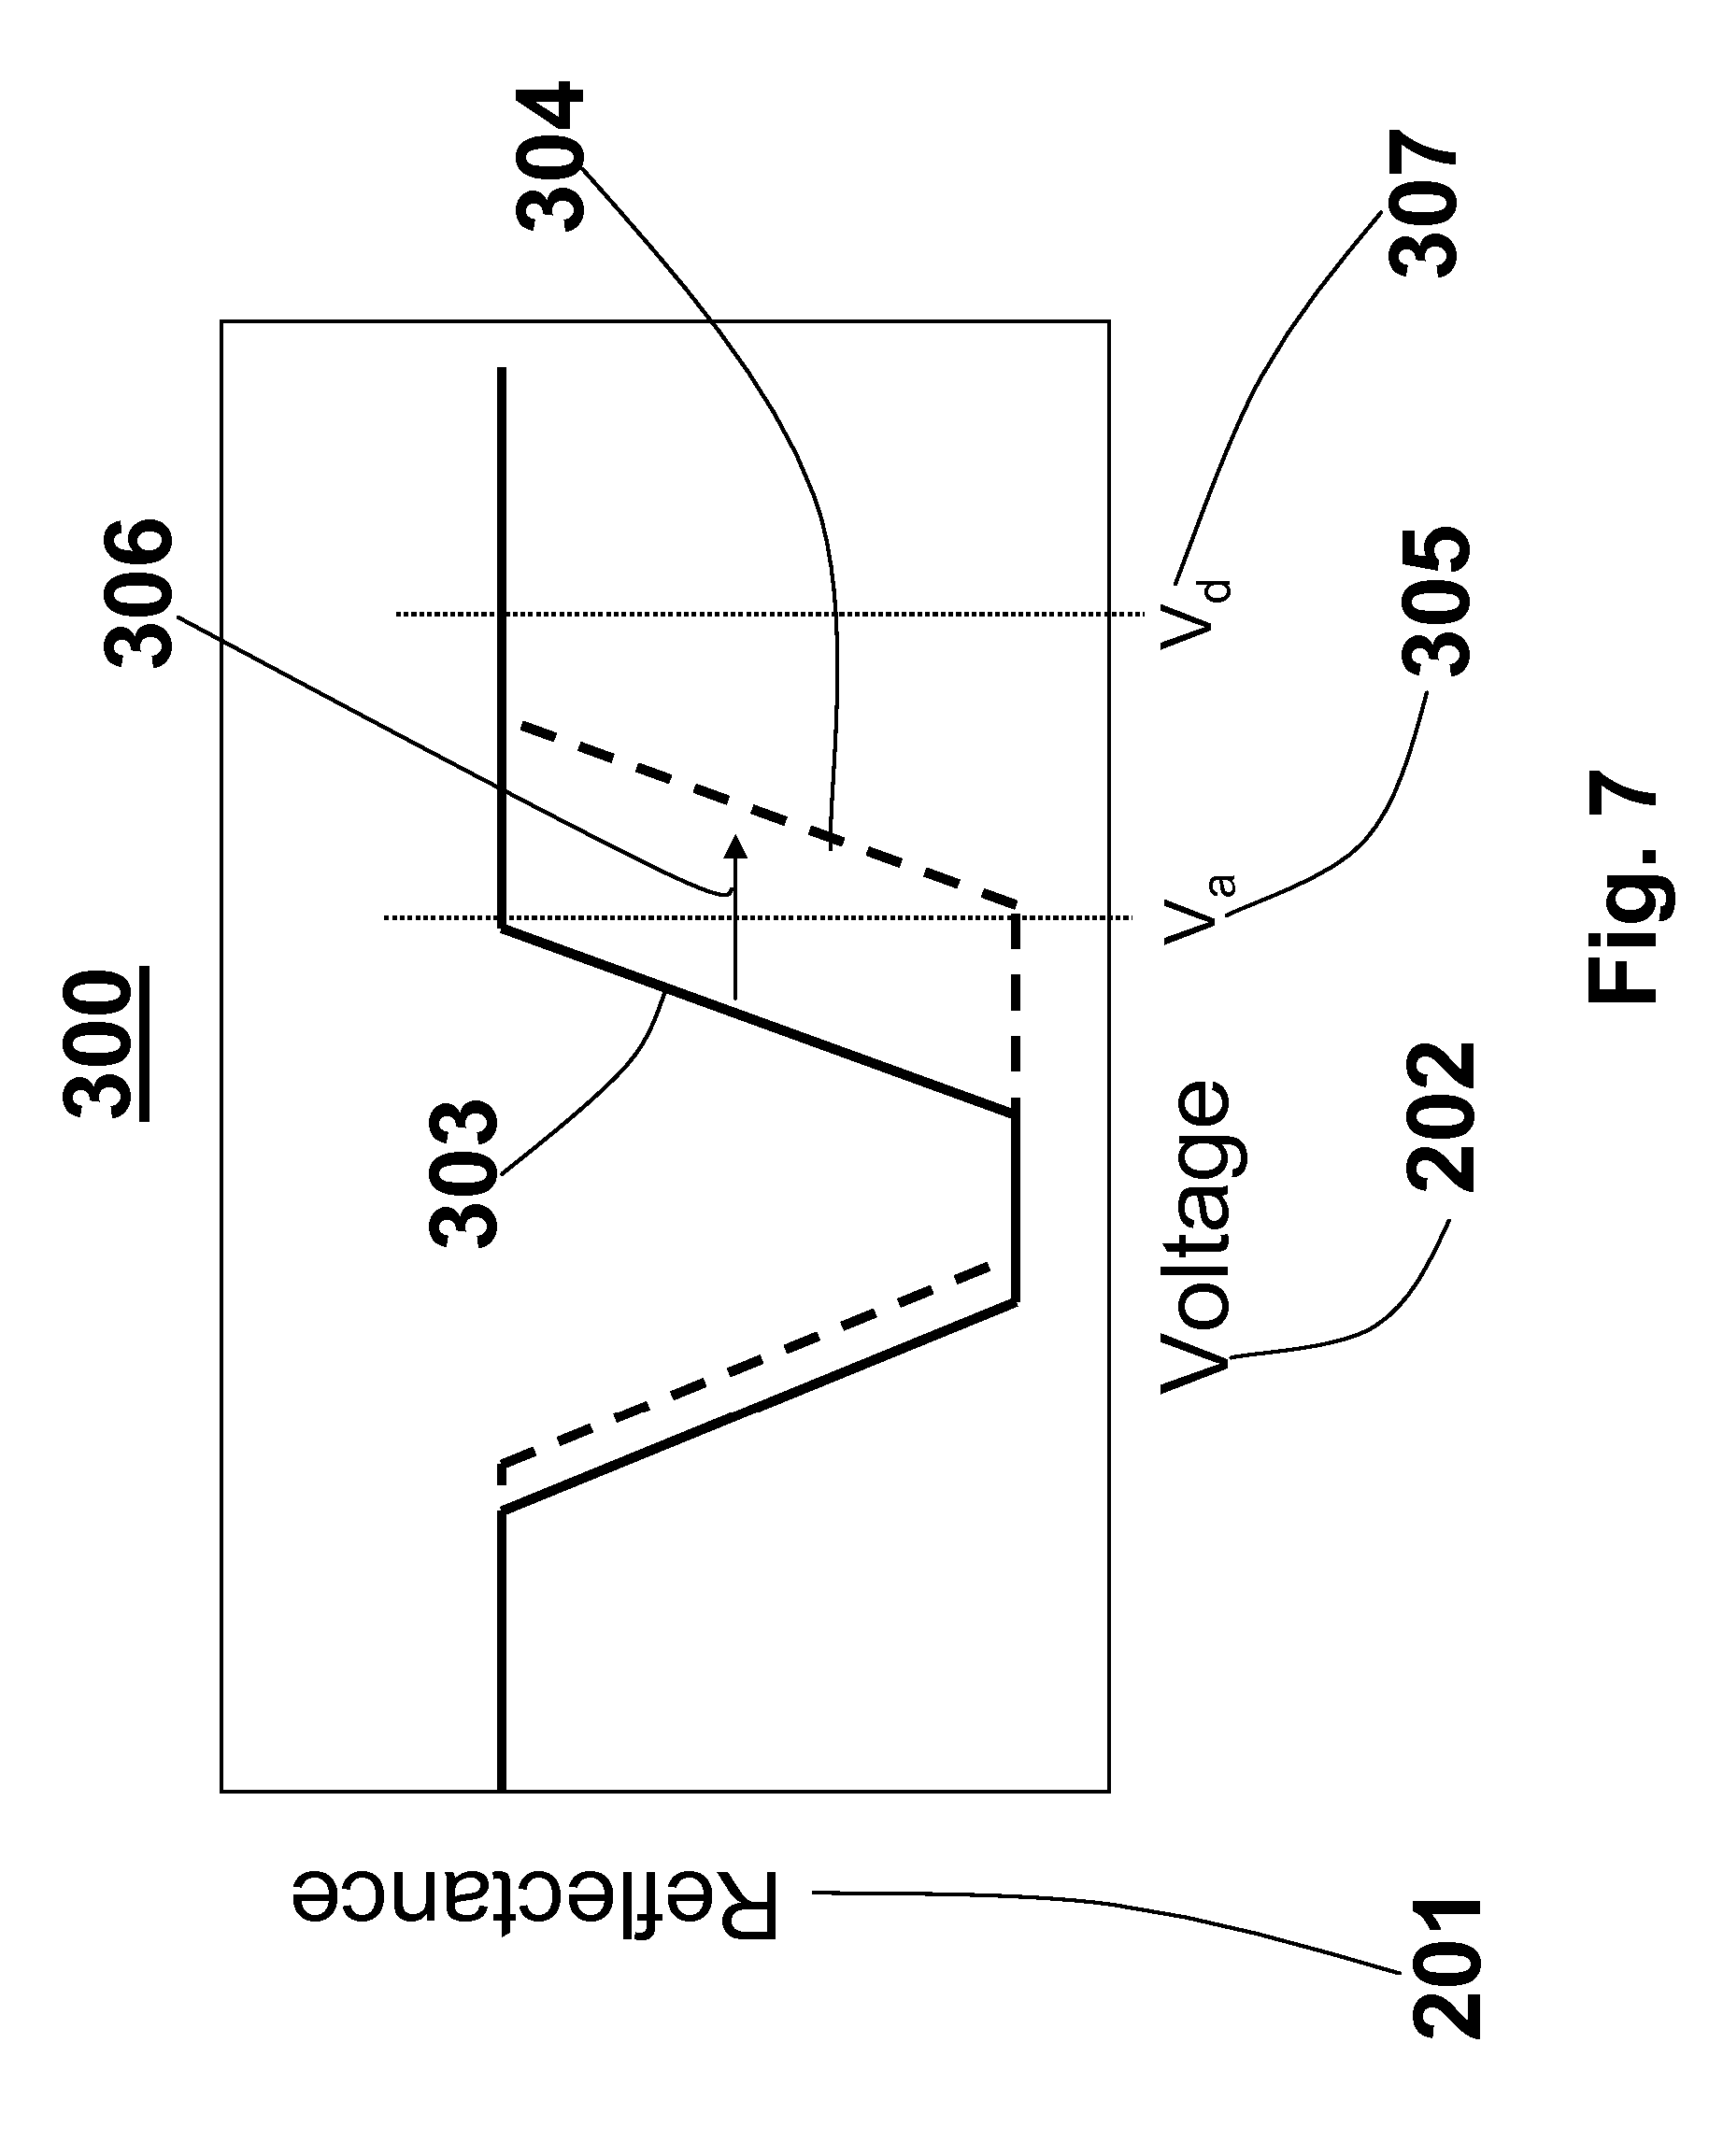 Patent US 8,329,058 B2